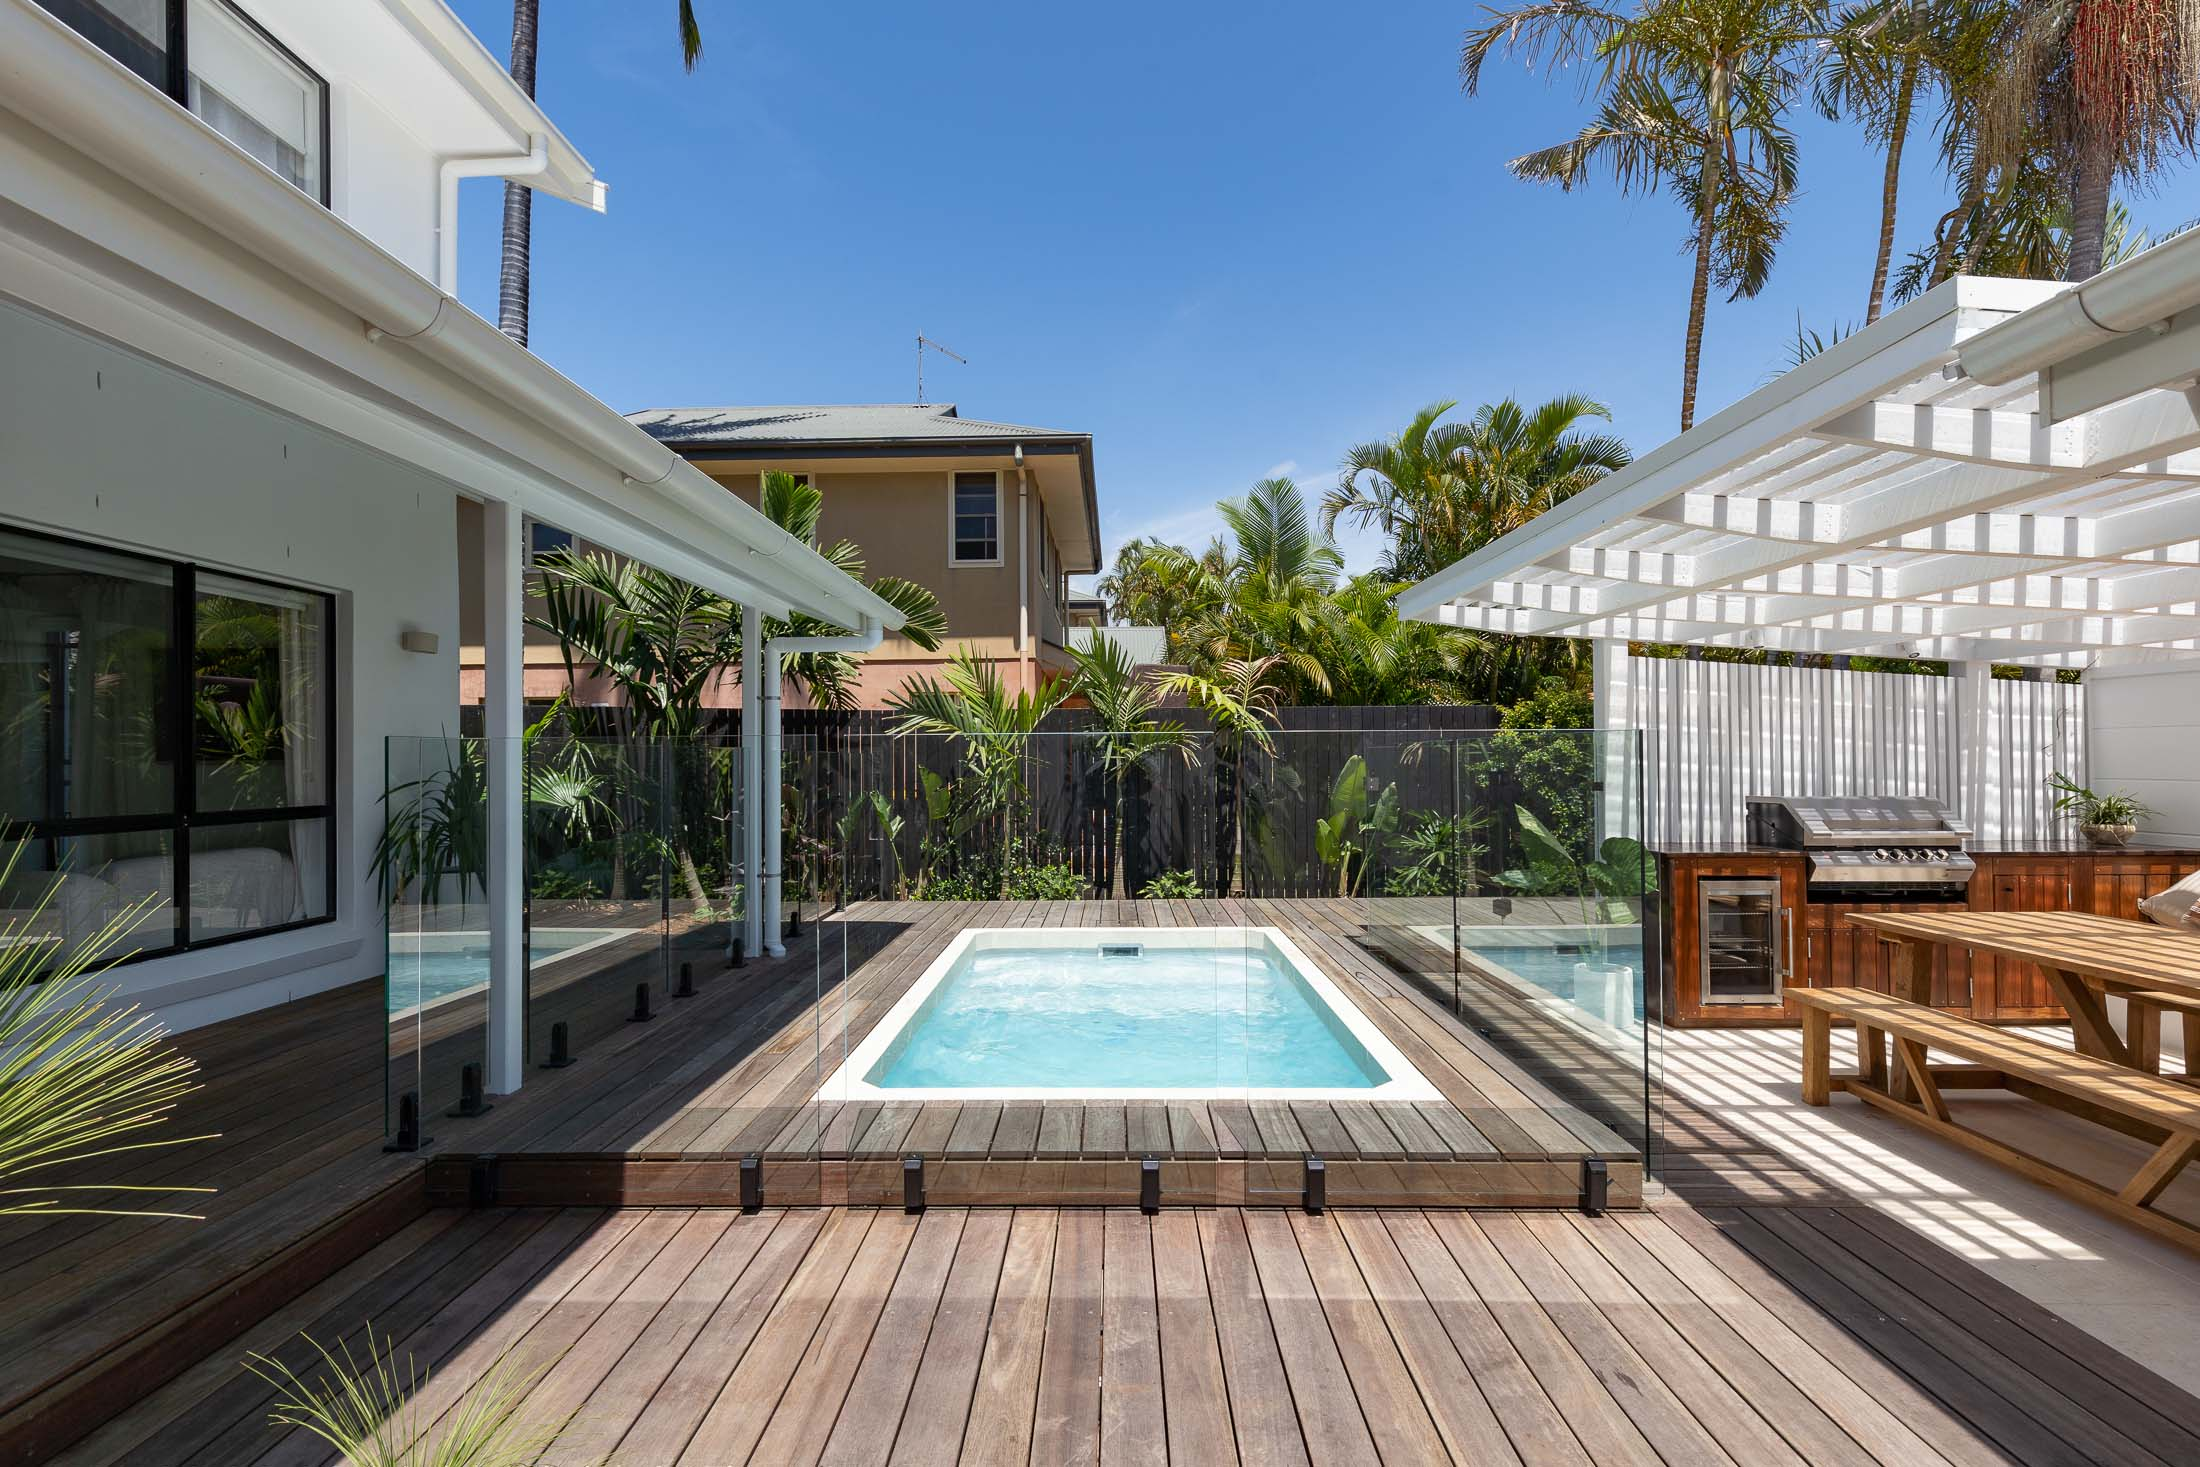 Byron Bay 3.6m x 2.2m Plungie Studio Concrete Plunge Pool in Kona Coast